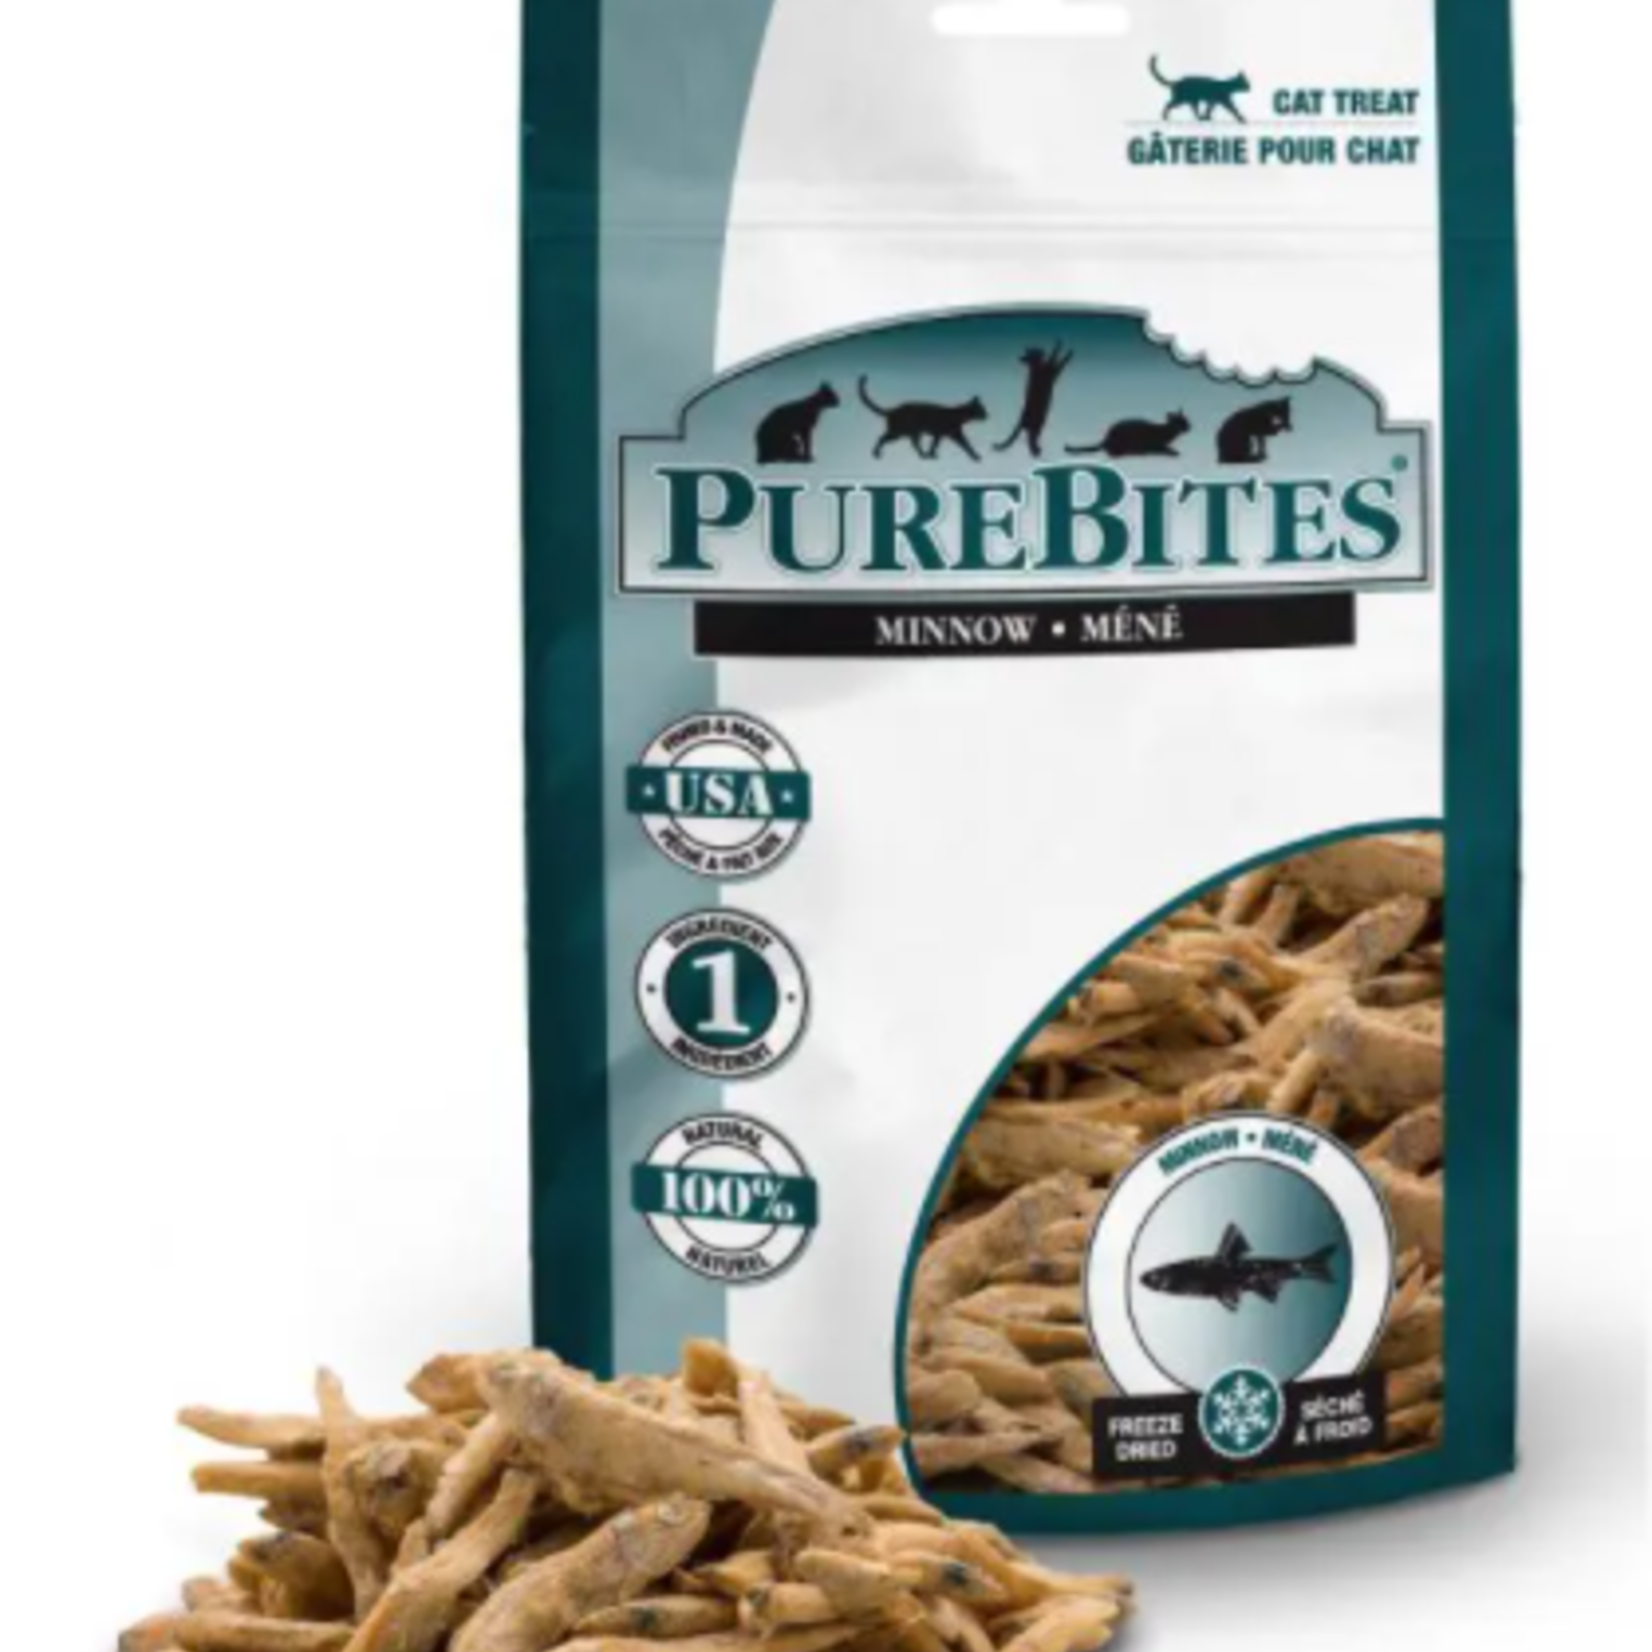 PureBites Minnow freezed dried cat treats (66g)